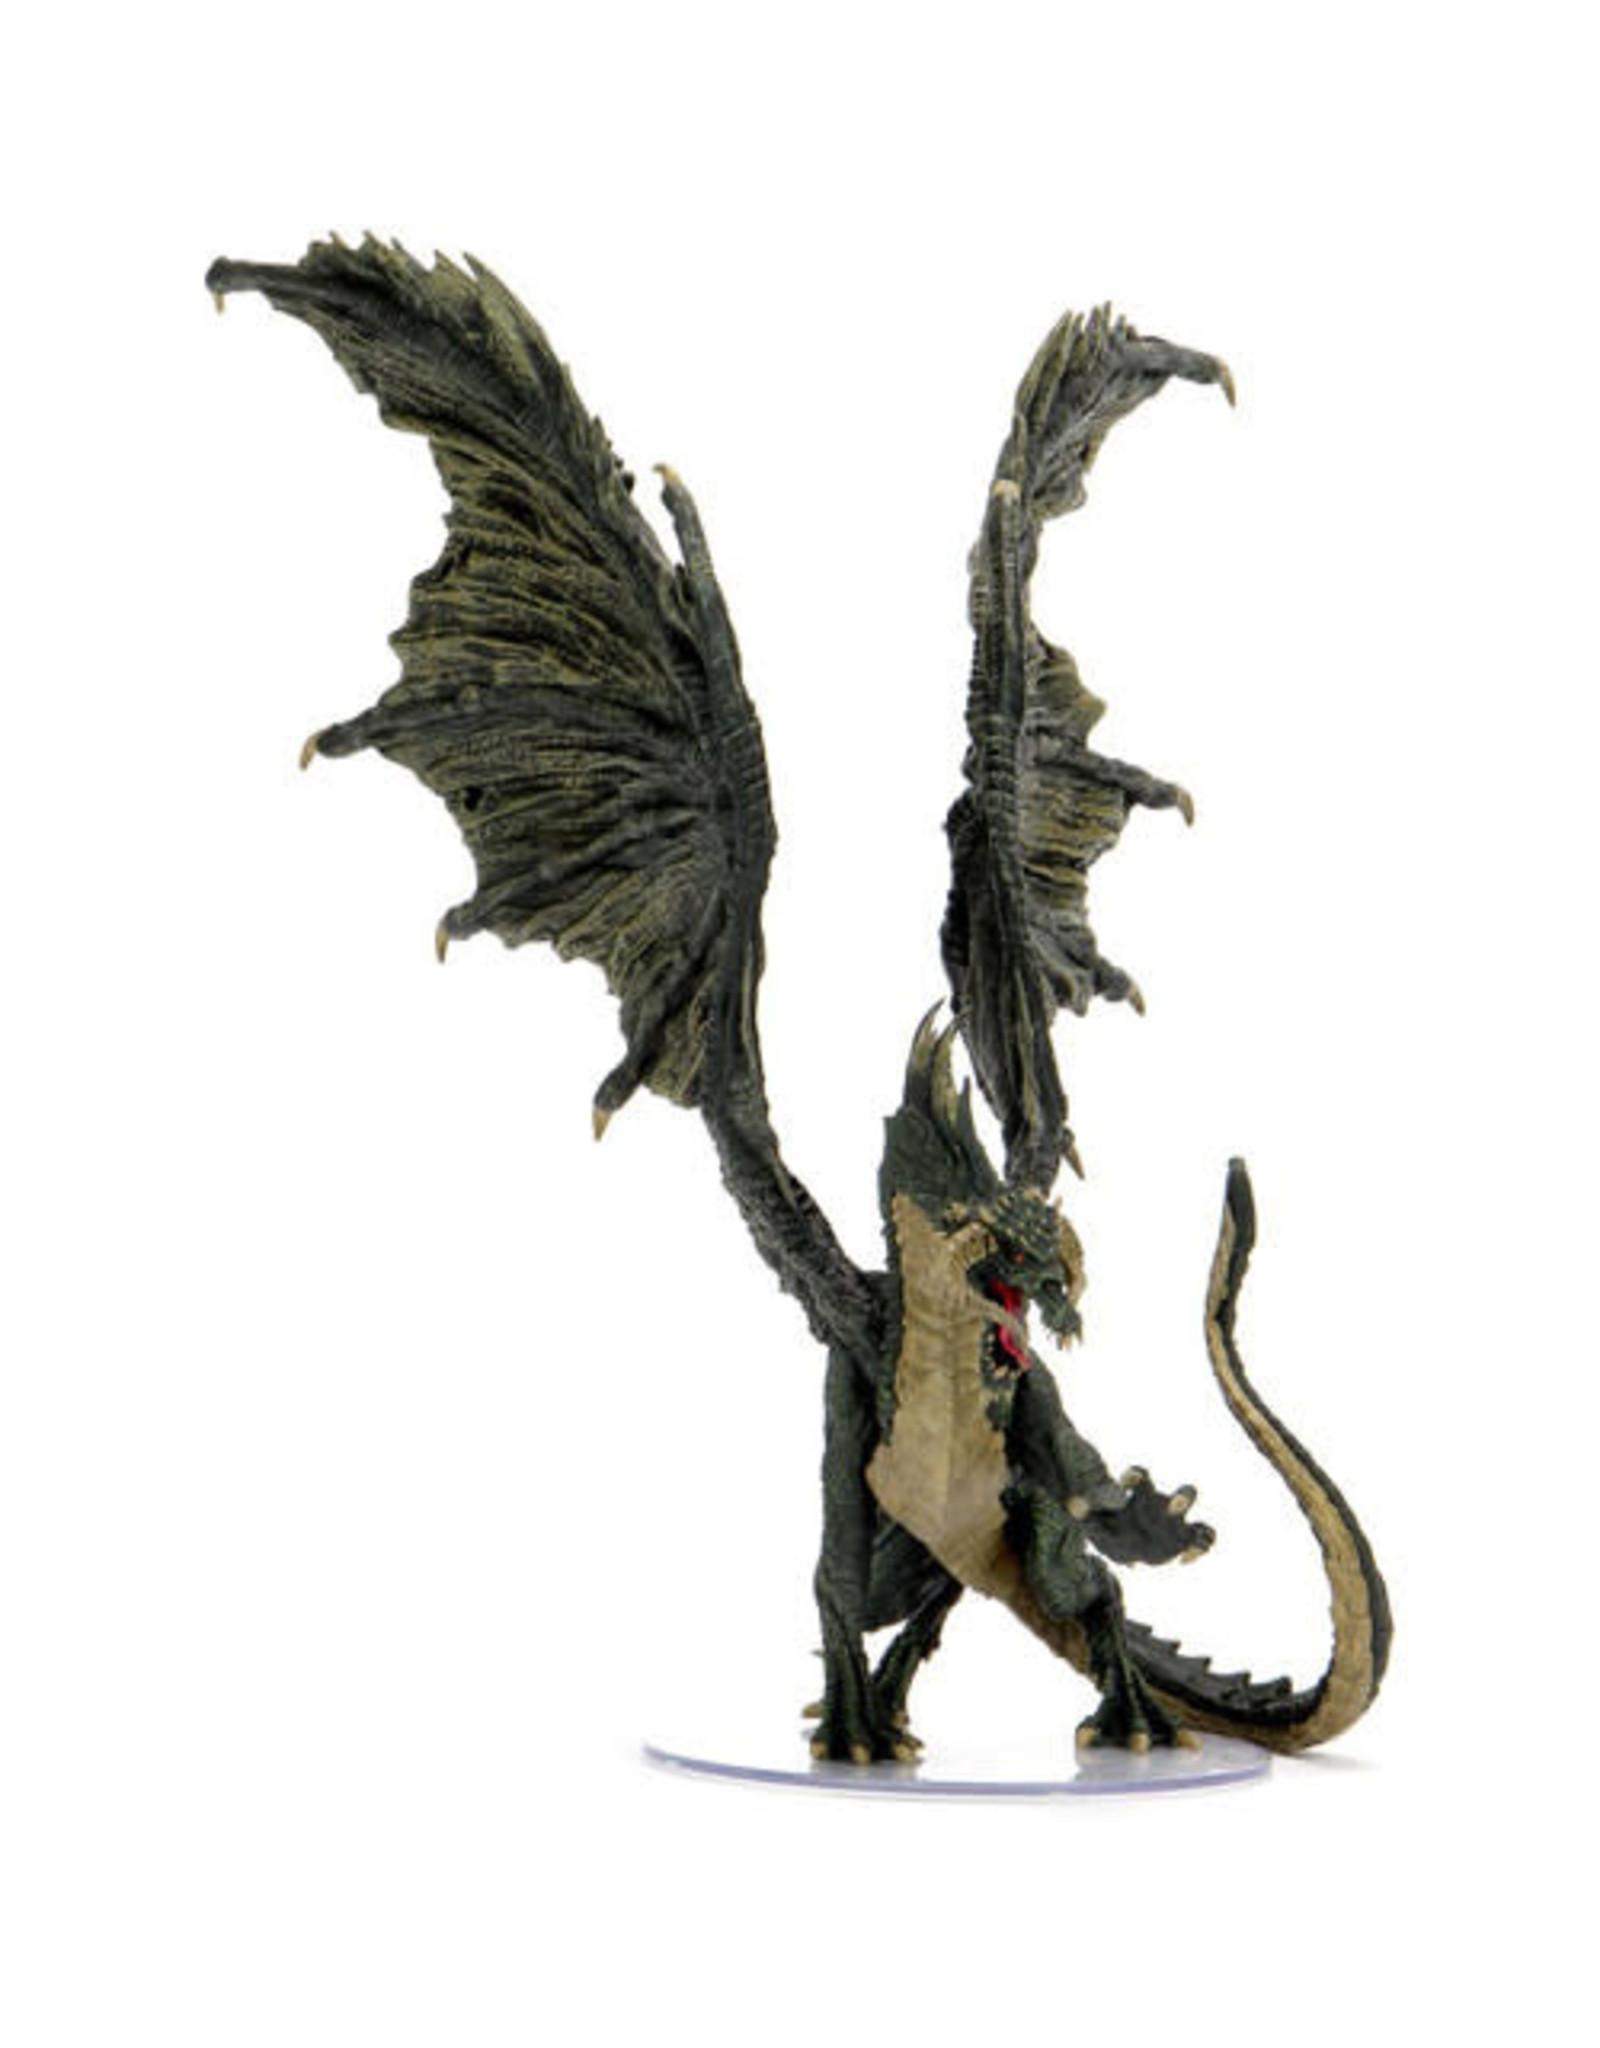 WizKids Dungeons & Dragons Fantasy Miniatures: Adult Black Dragon Premium Figure